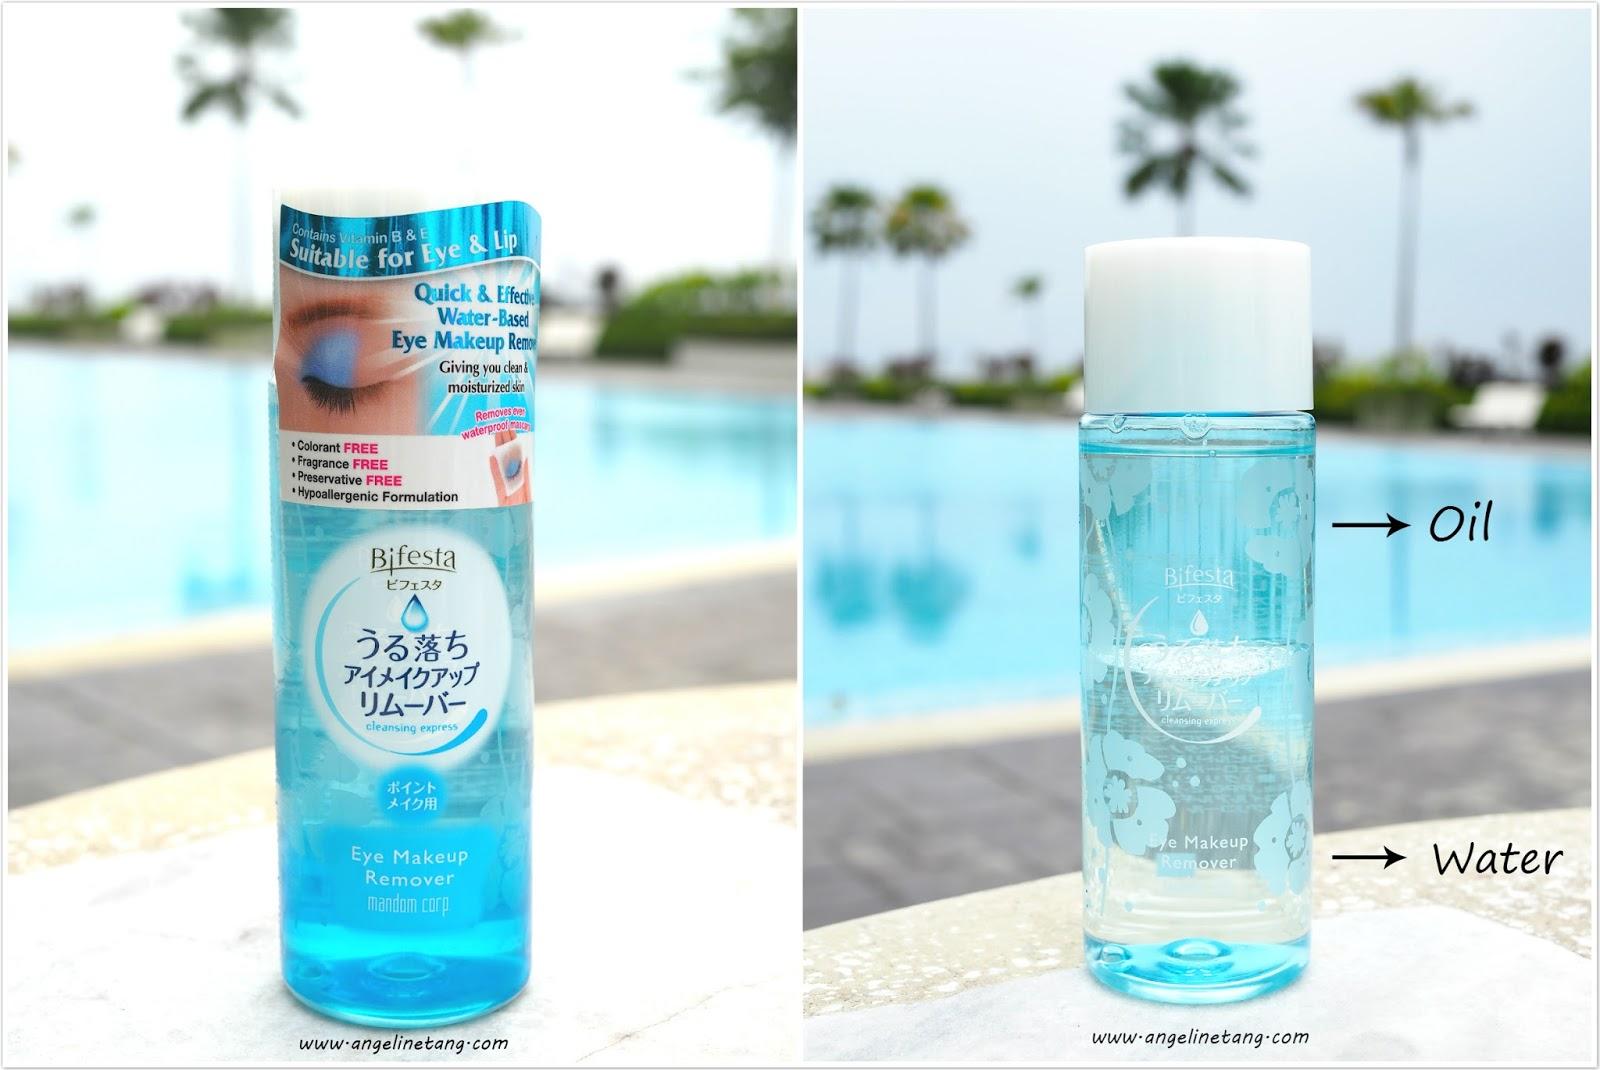 Water based eye makeup remover